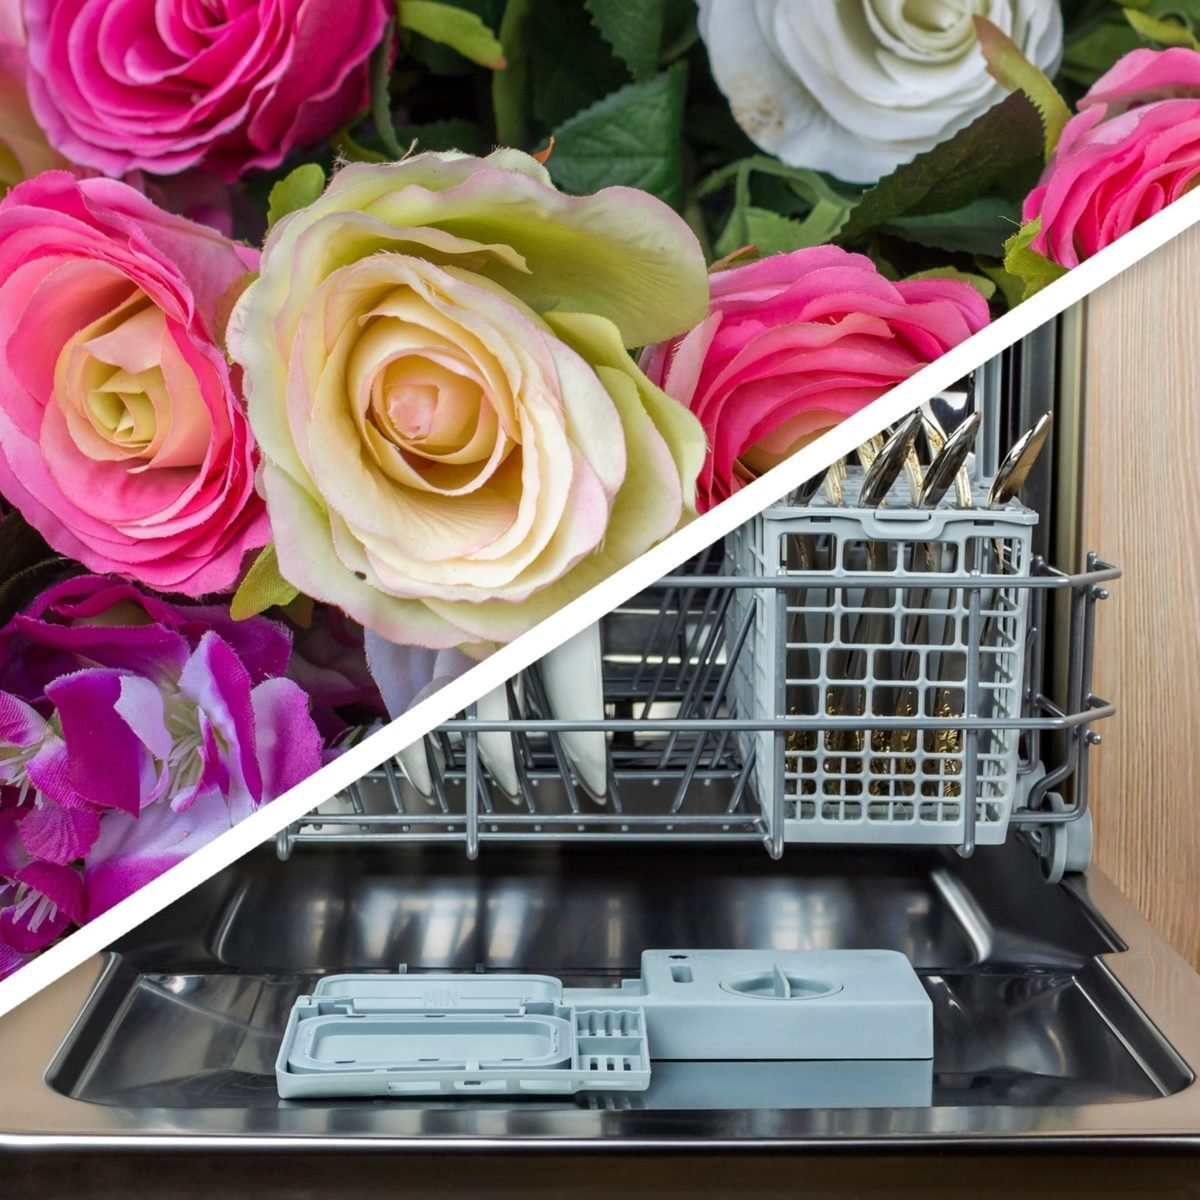 Fake flowers and dishwasher